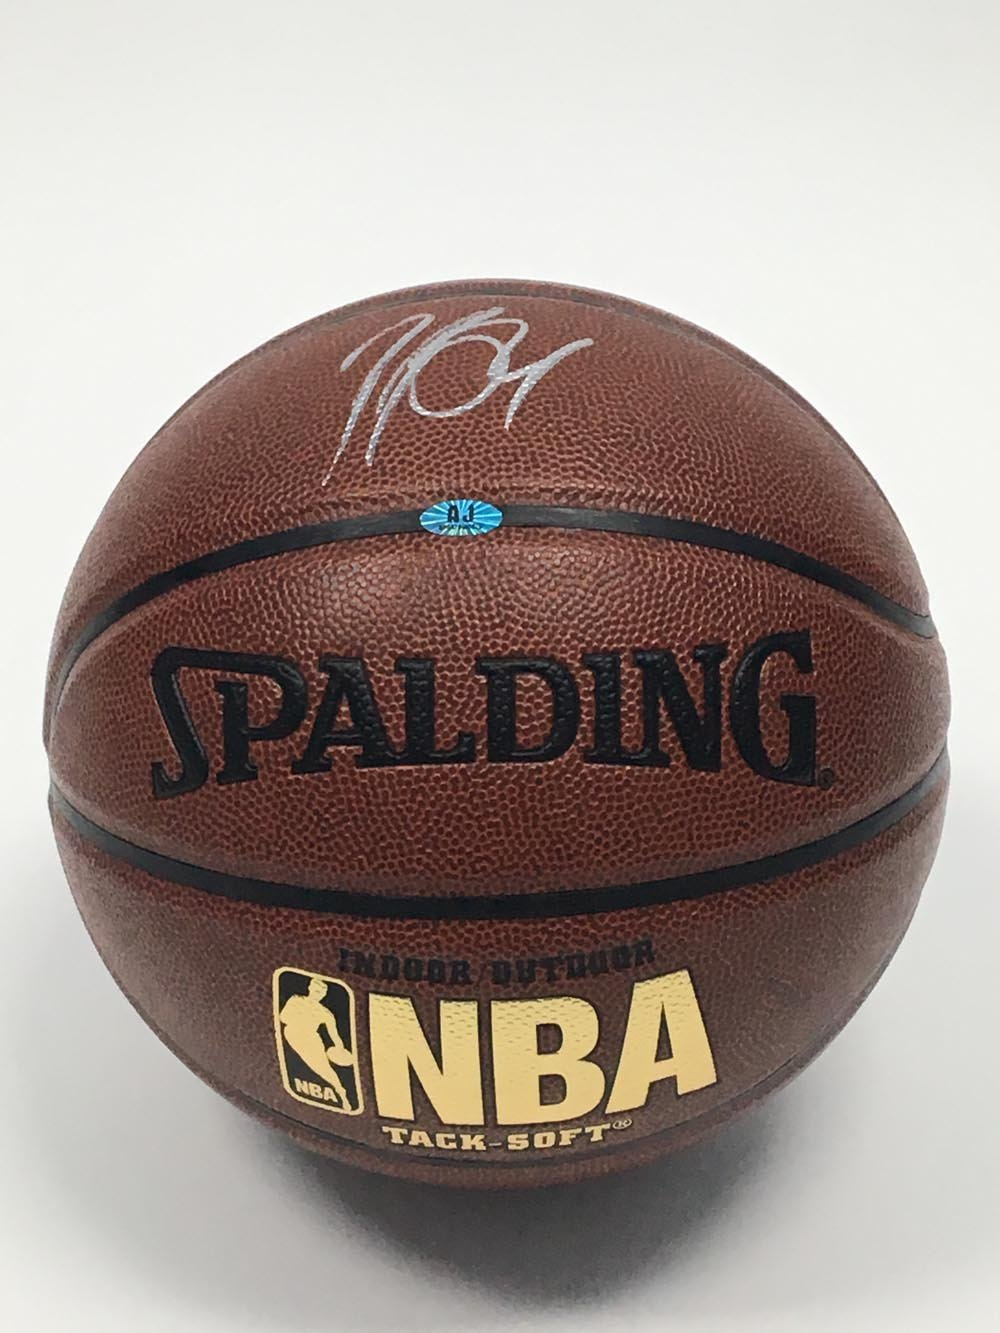 Patrick Patterson Autographed Spalding NBA I/O Basketball - Houston Rockets A.J. Sports World